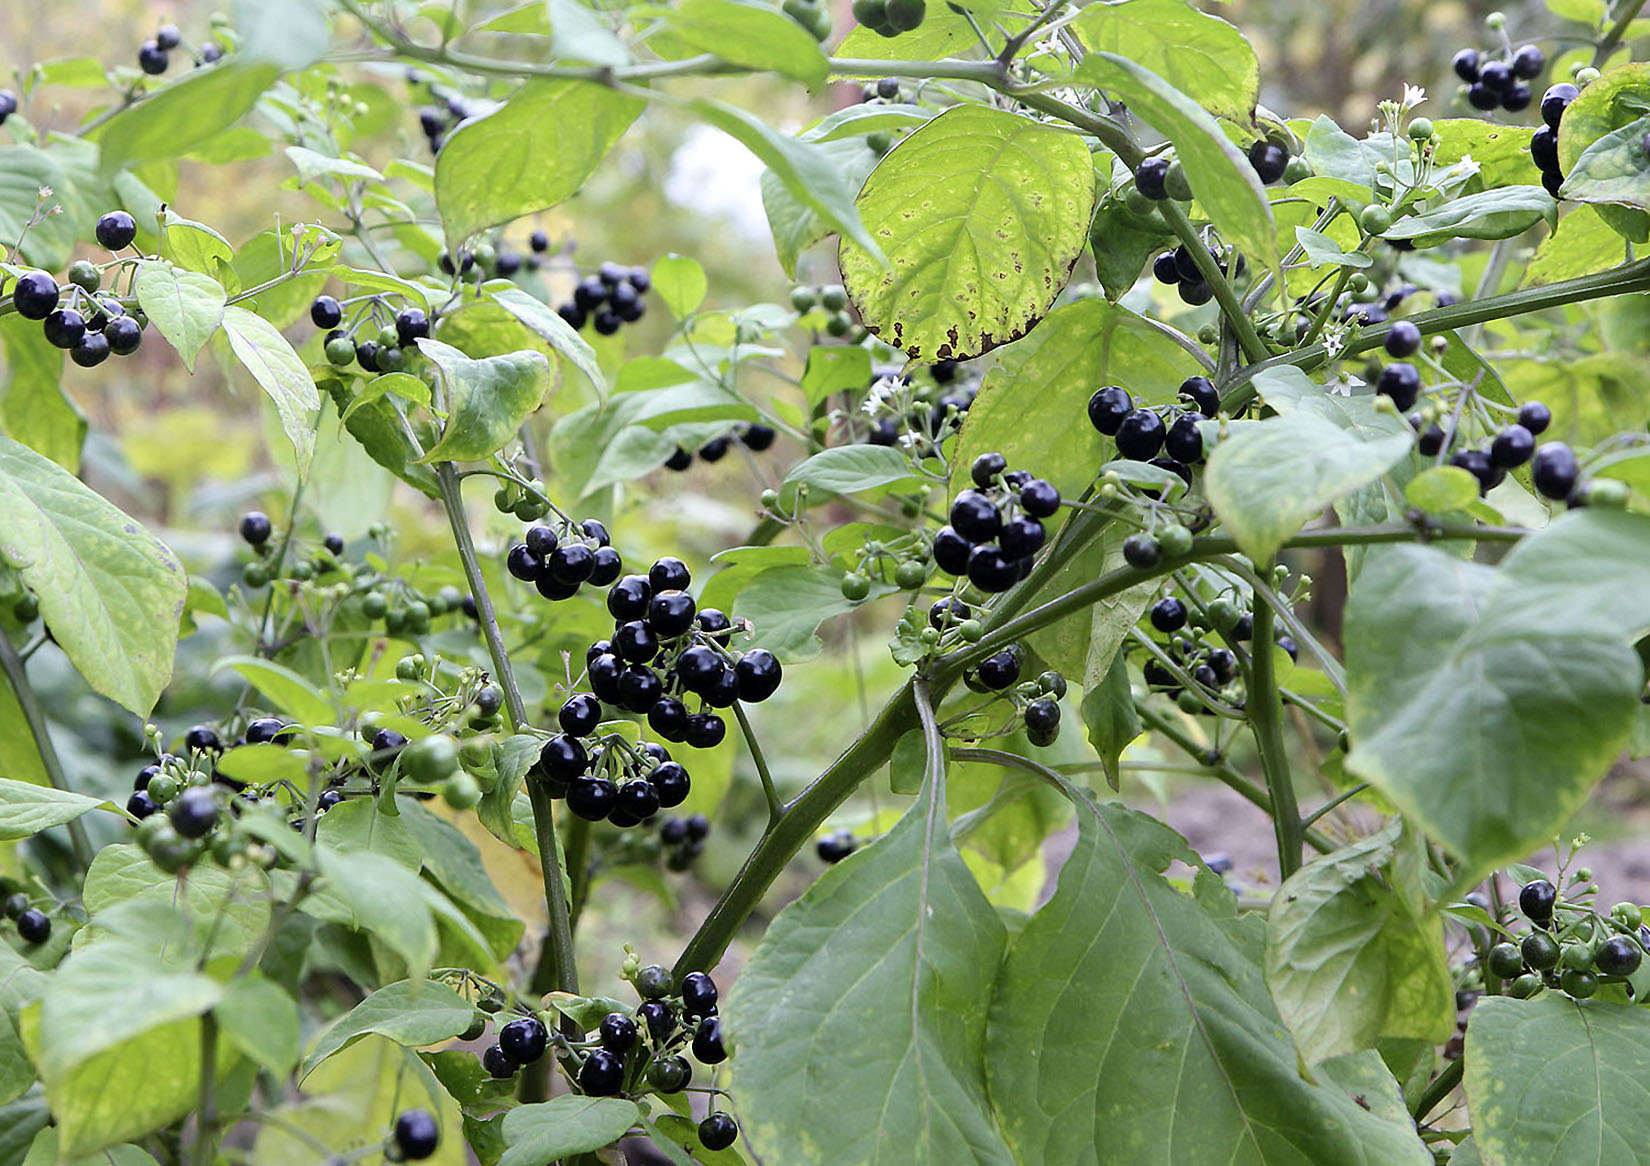 Sodo mėlynės augalas